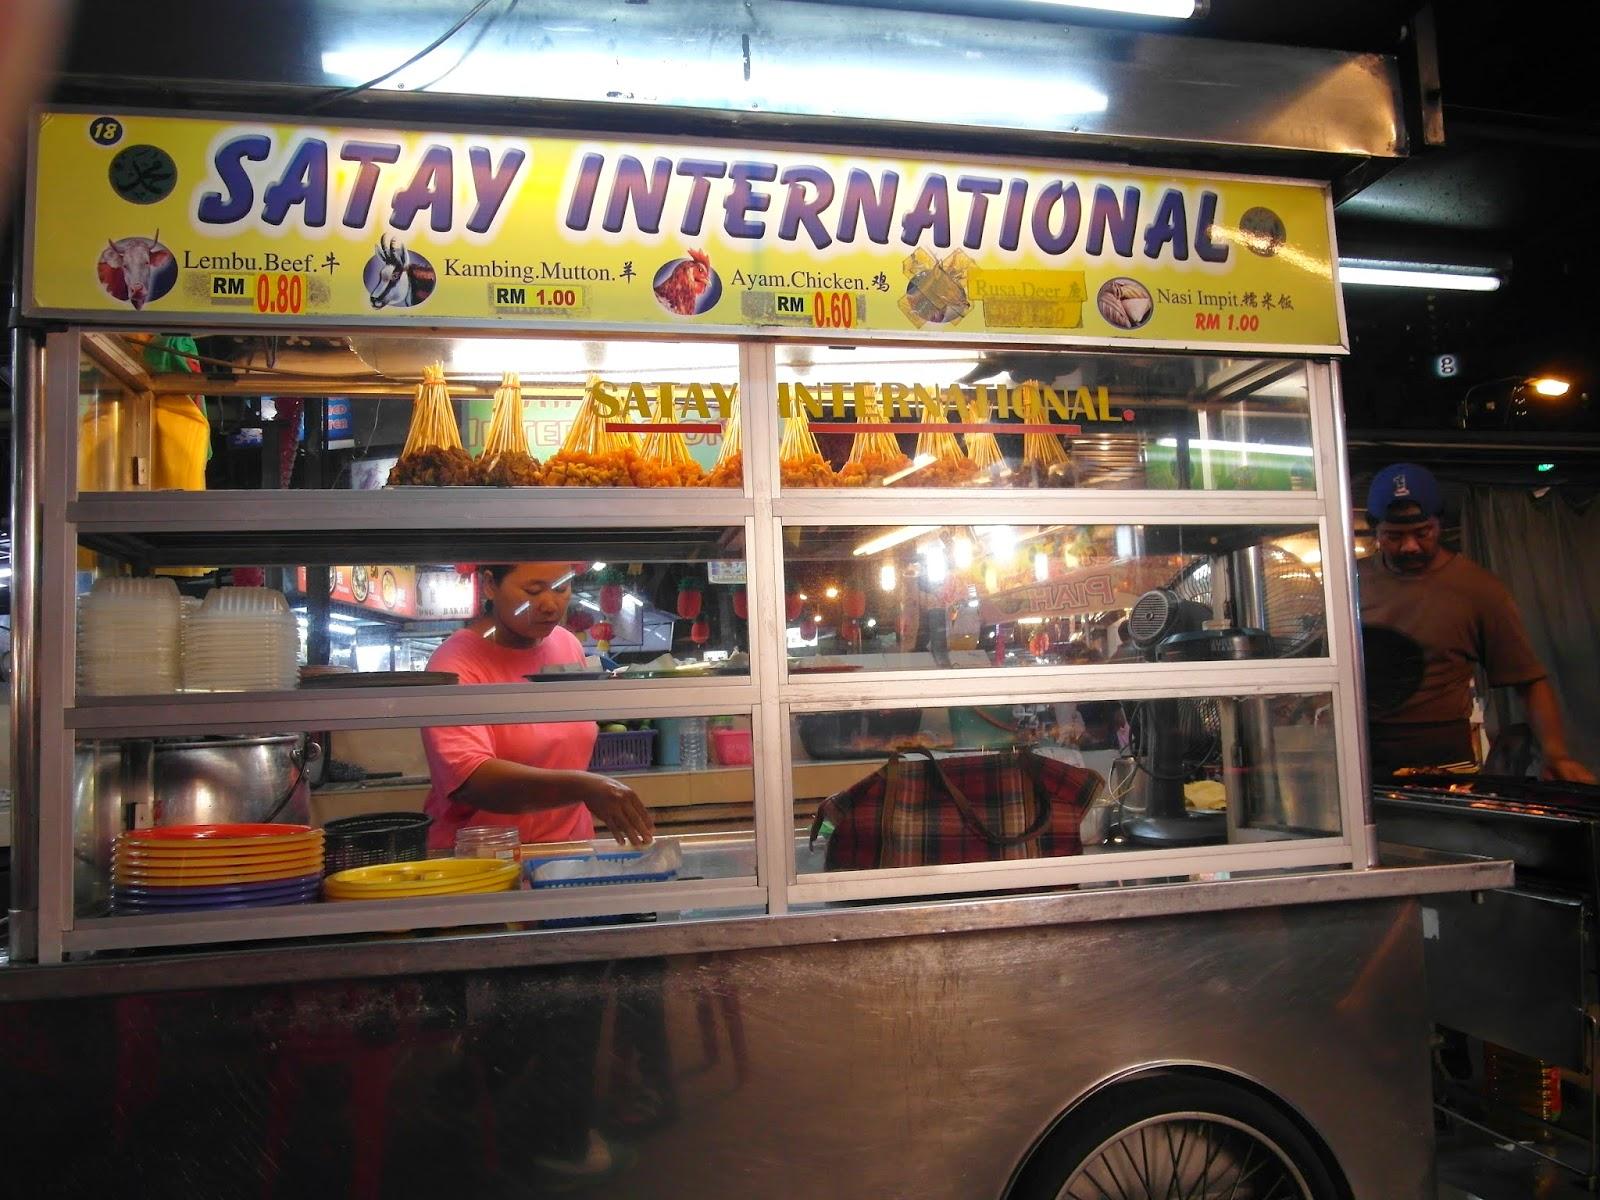 Janis & Jack~~*幸福點滴~~: 馬來西亞檳城4日3夜之旅 - Day 1 (新關仔角夜市,Gurney Place)